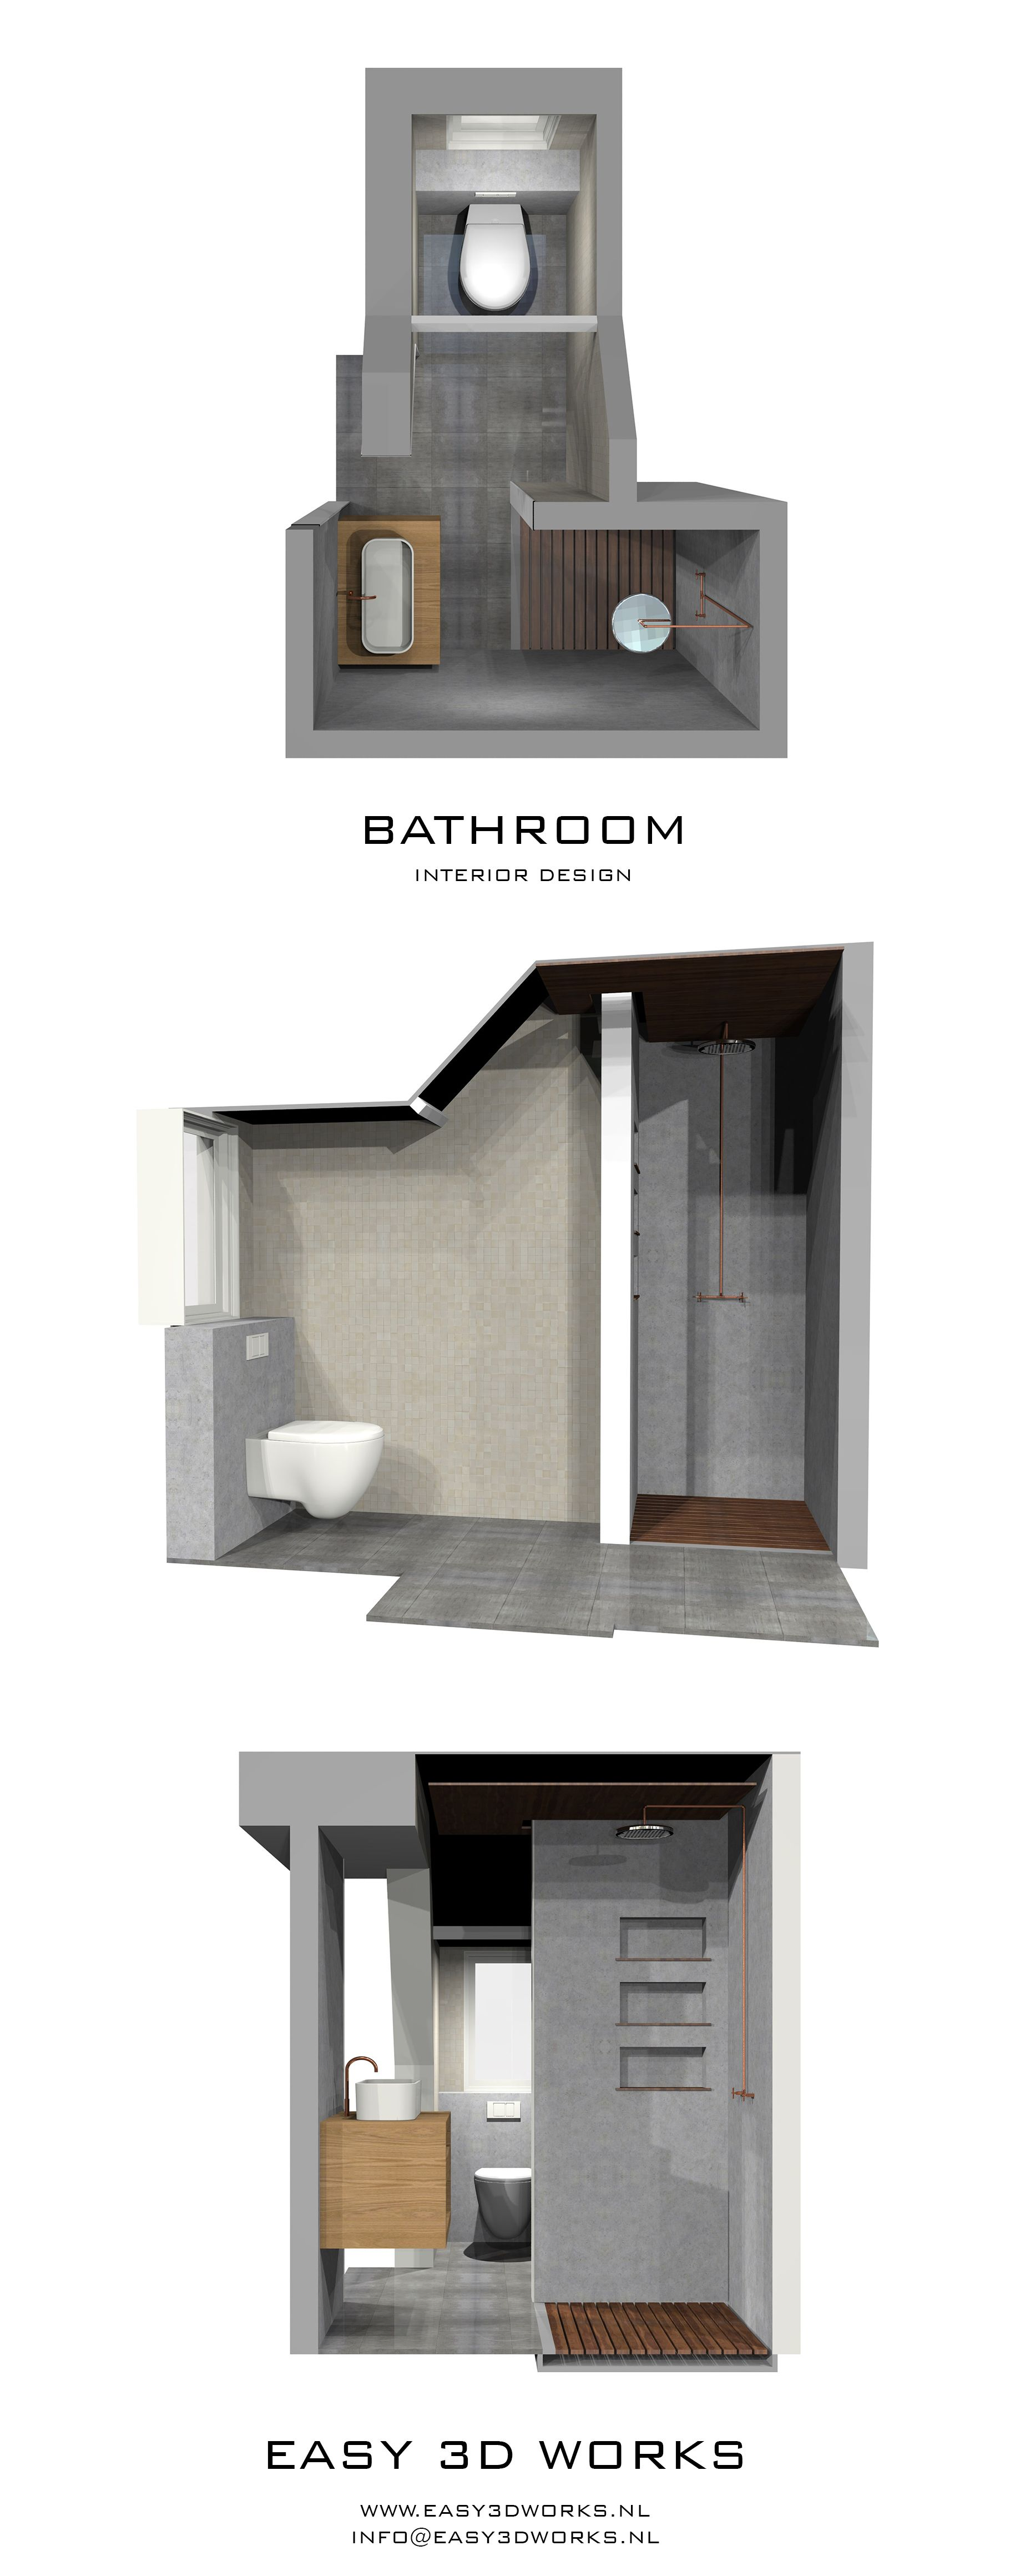 Modern Bathroom 3D Impression Architecture Render Visualization Interior BathroomsExterior DesignModelingHome